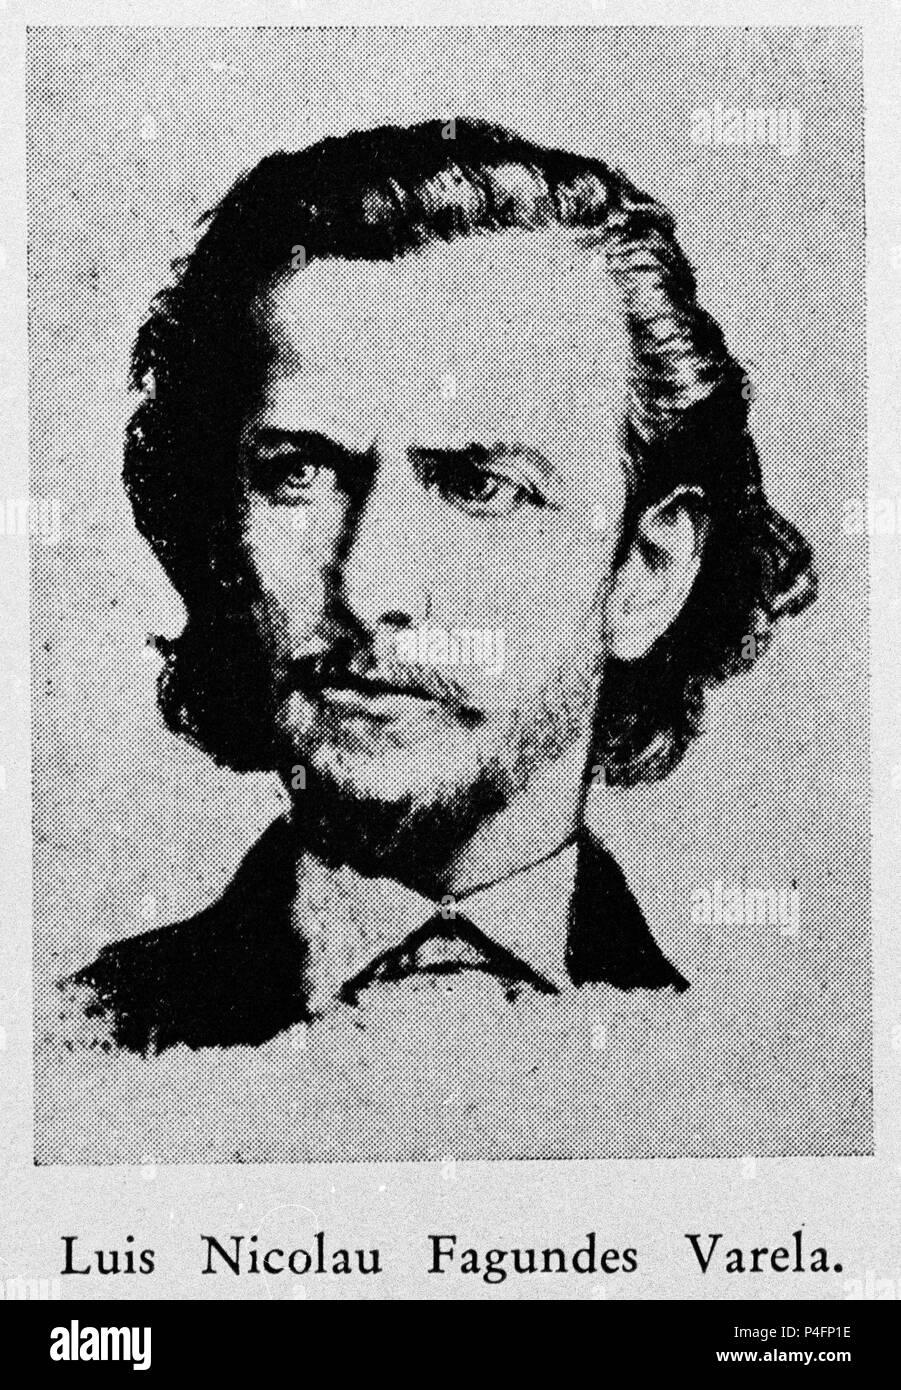 LUIS FAGUNDES VARELA (1841/1875) - POETA BRASILEÑO - romanticismo. Immagini Stock